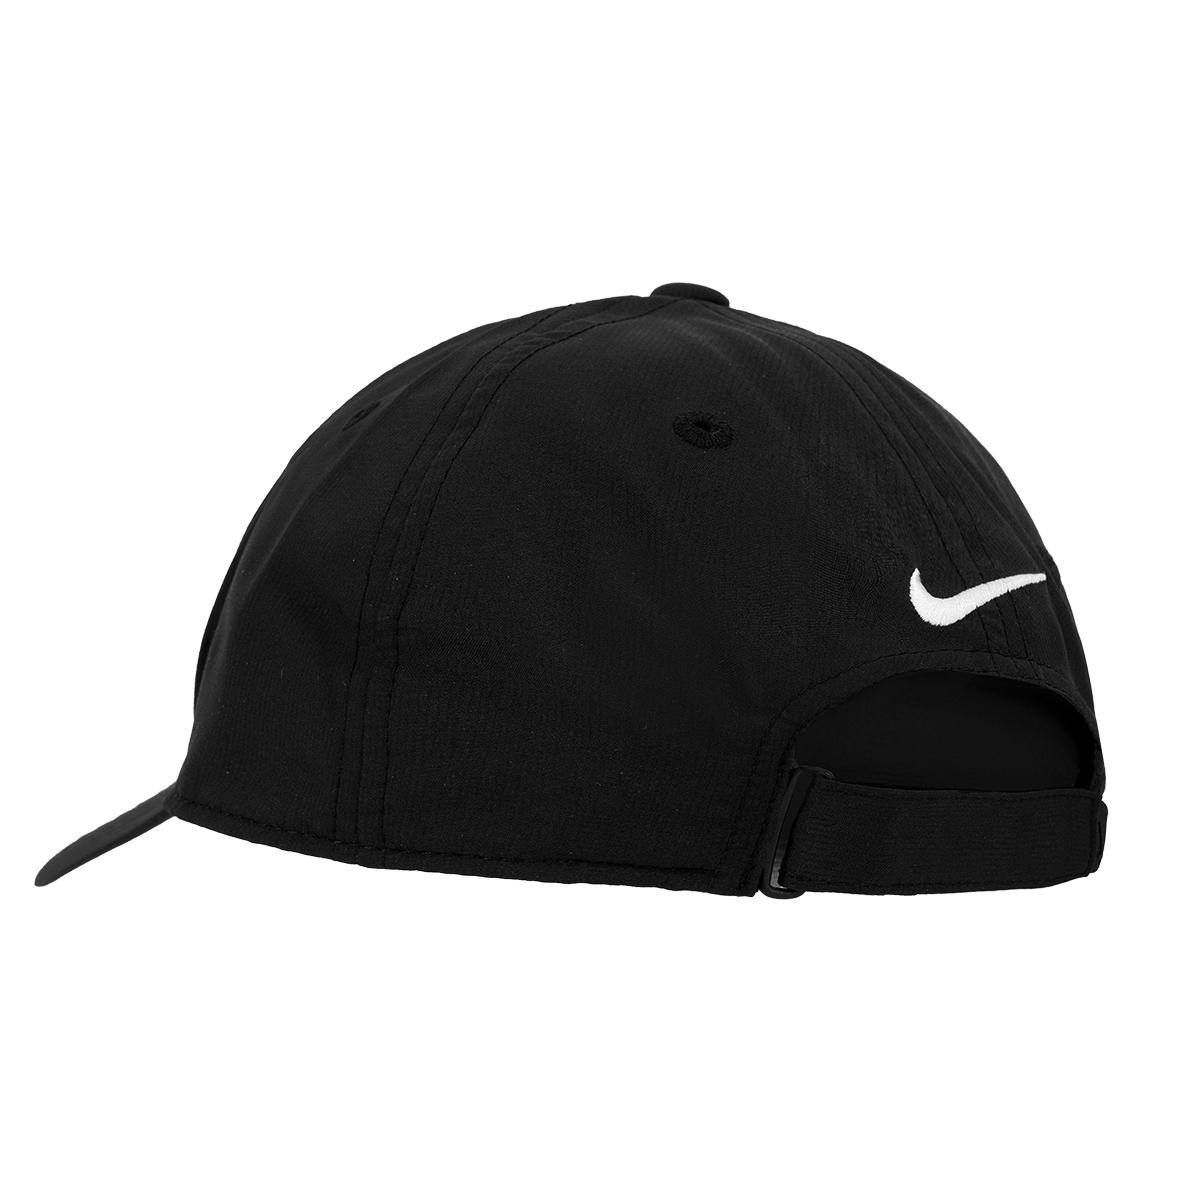 Nike-Legacy-91-Adjustable-Hat thumbnail 3